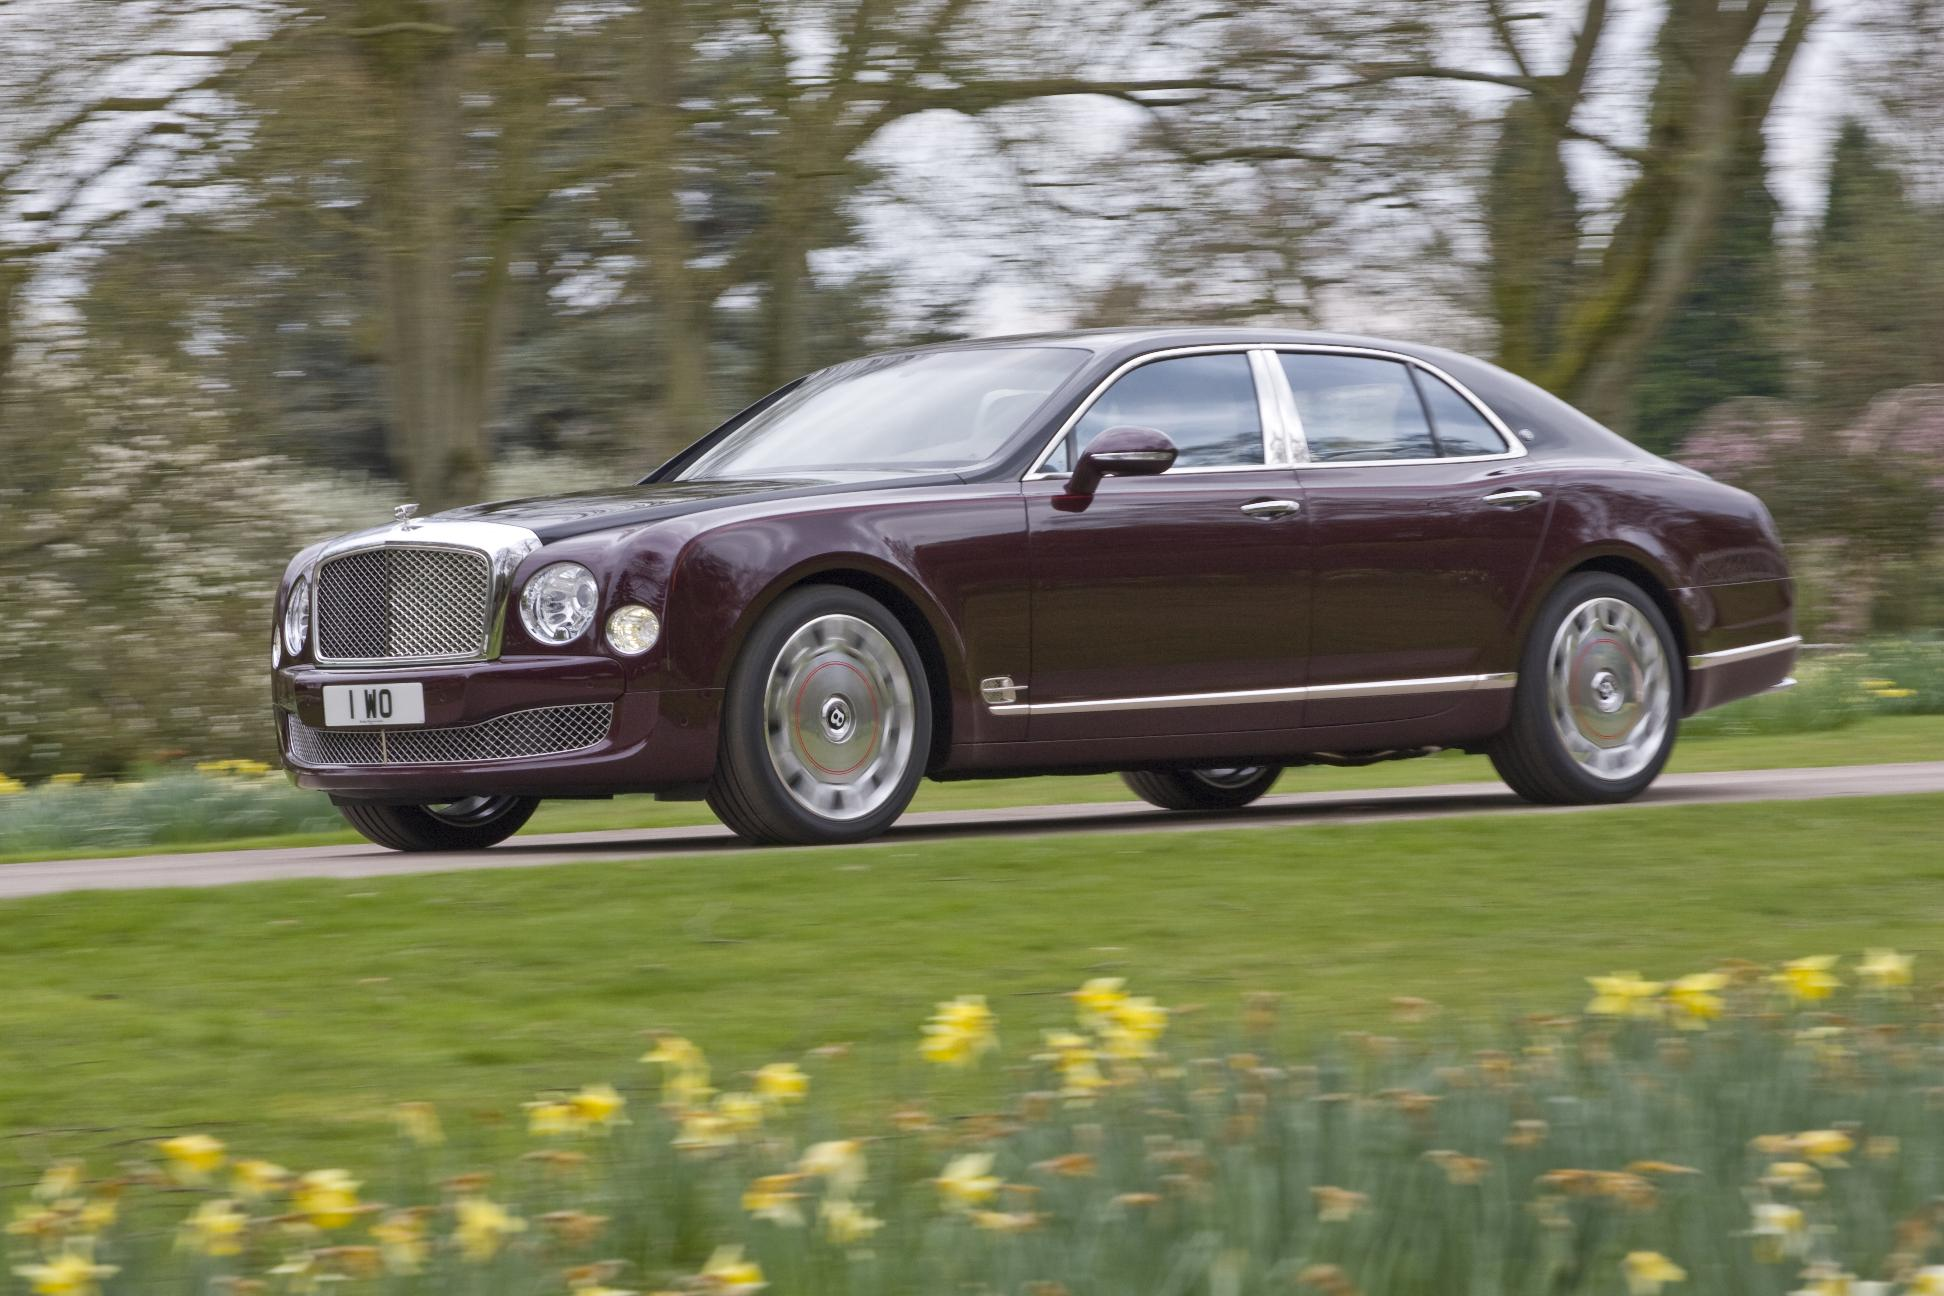 Bentley Mulsanne Diamond Jubilee Edition Driving 2